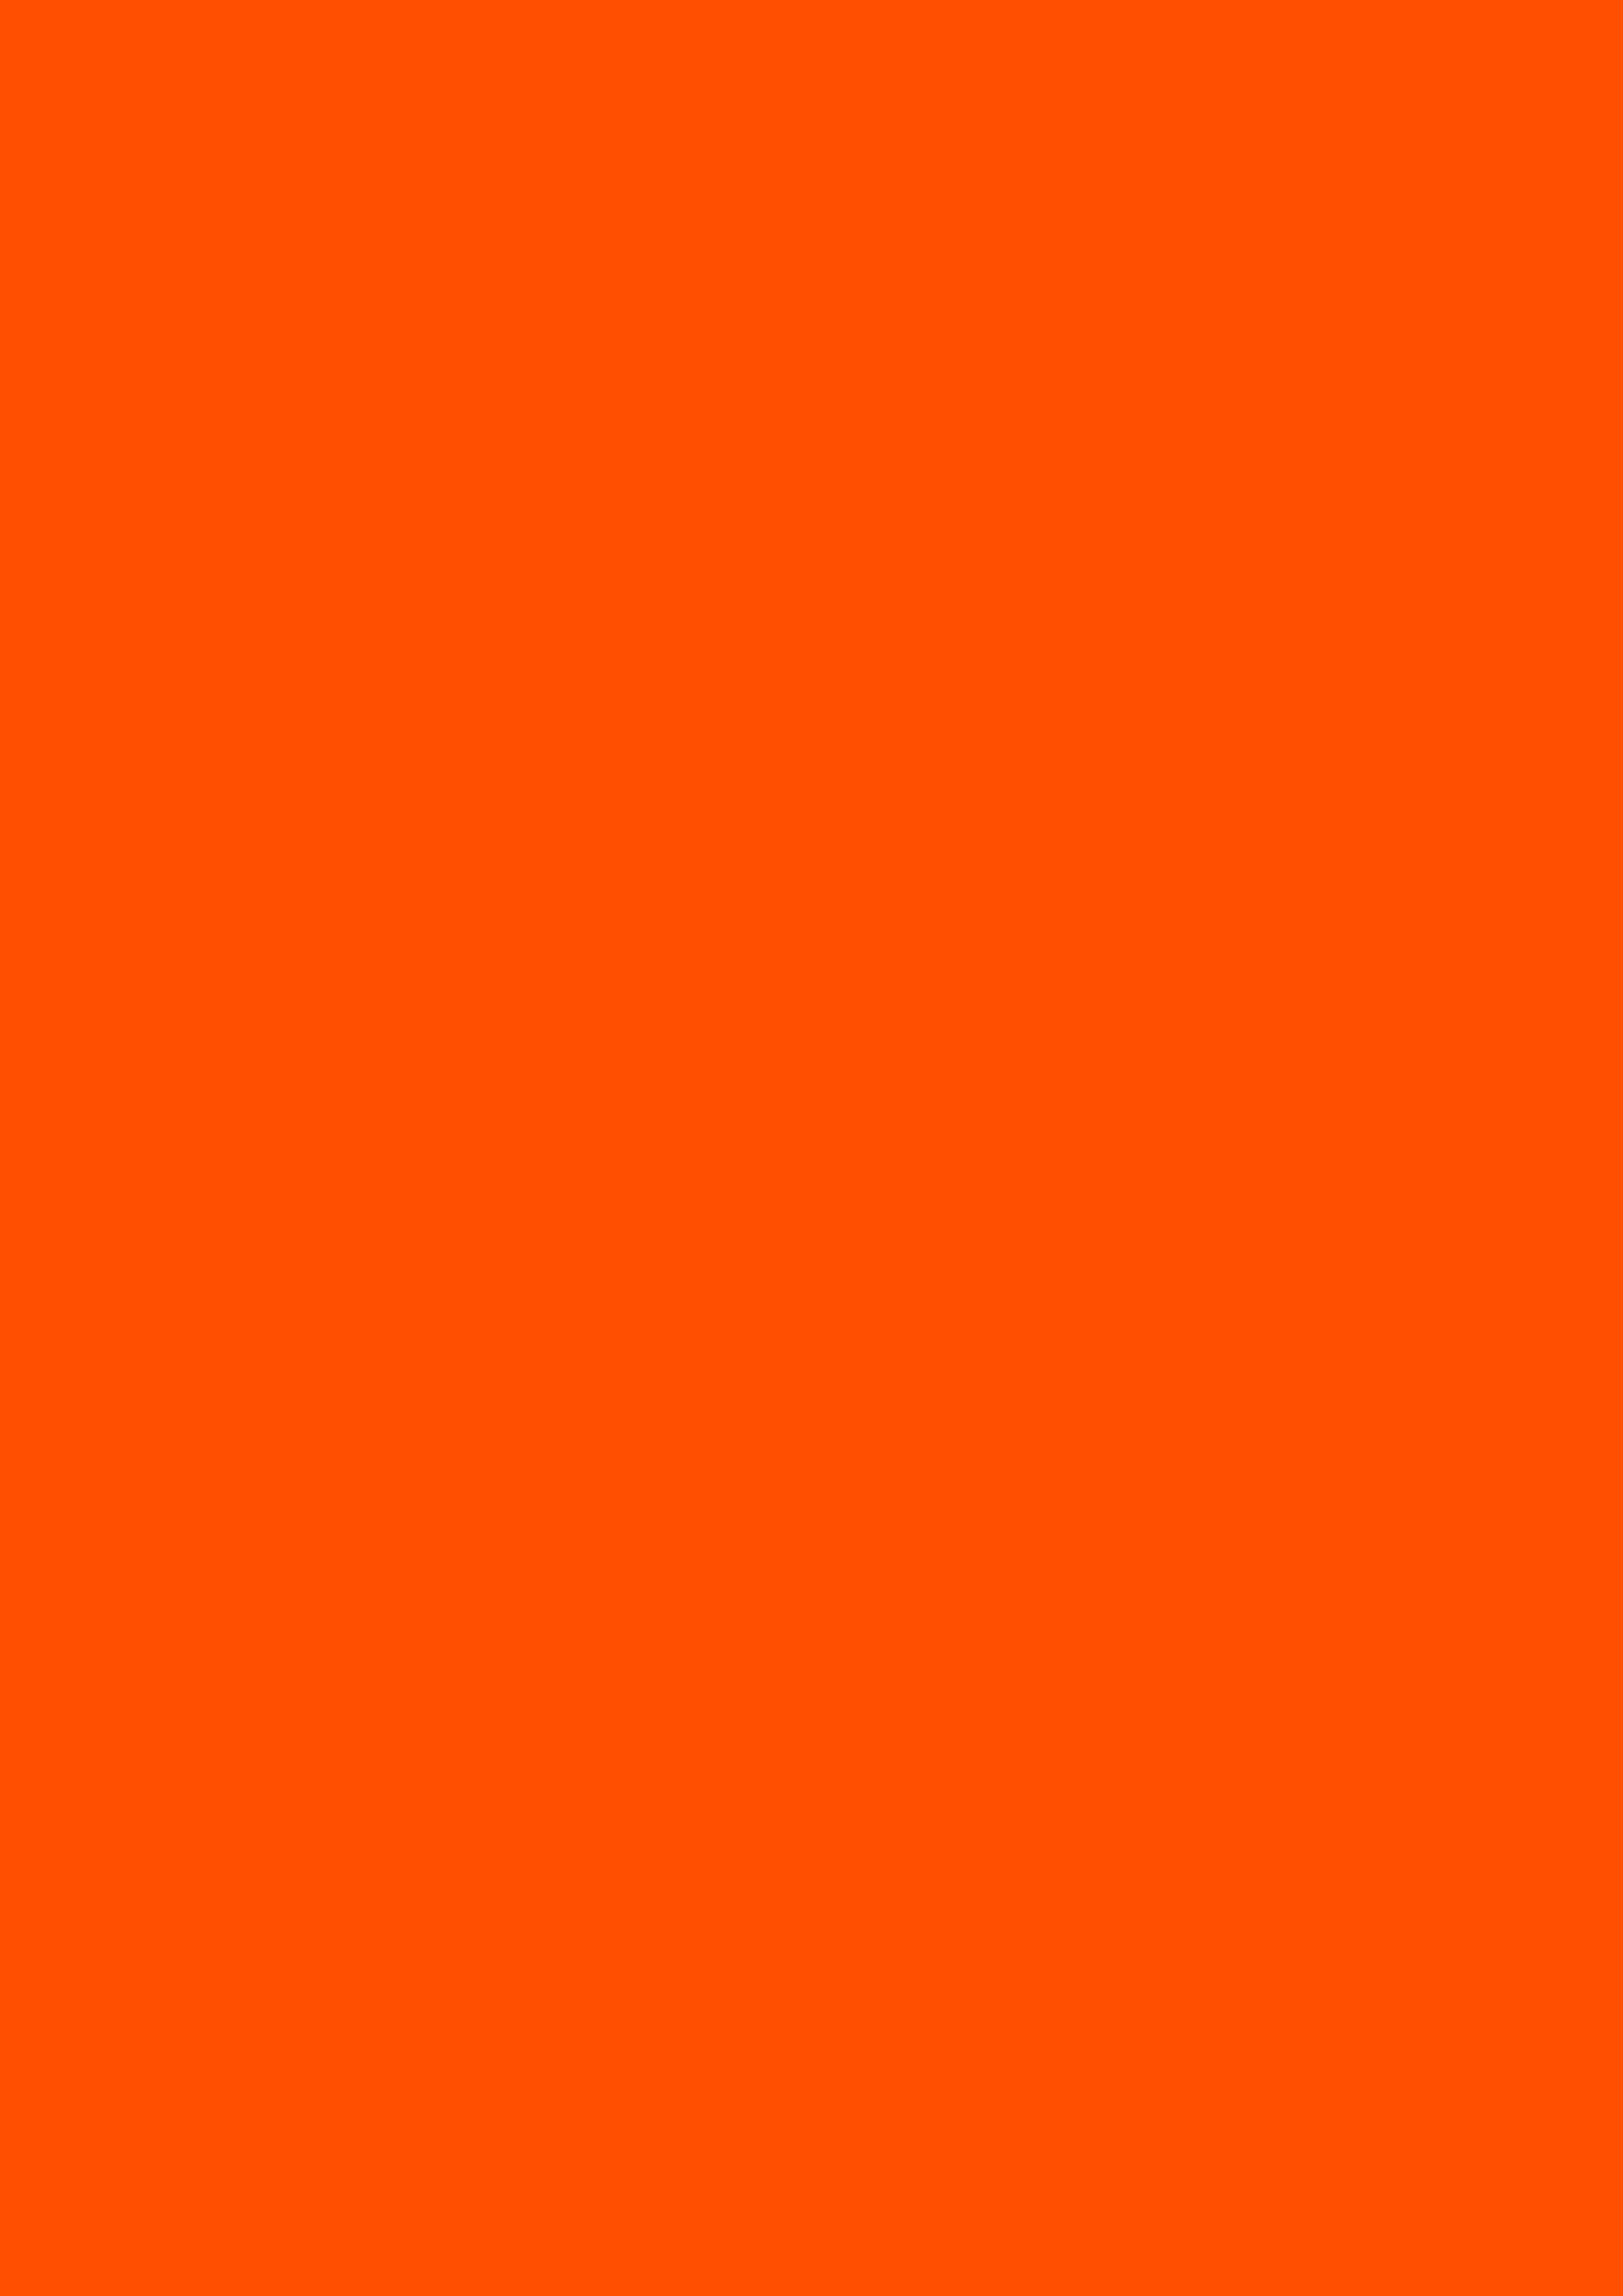 2480x3508 International Orange Aerospace Solid Color Background